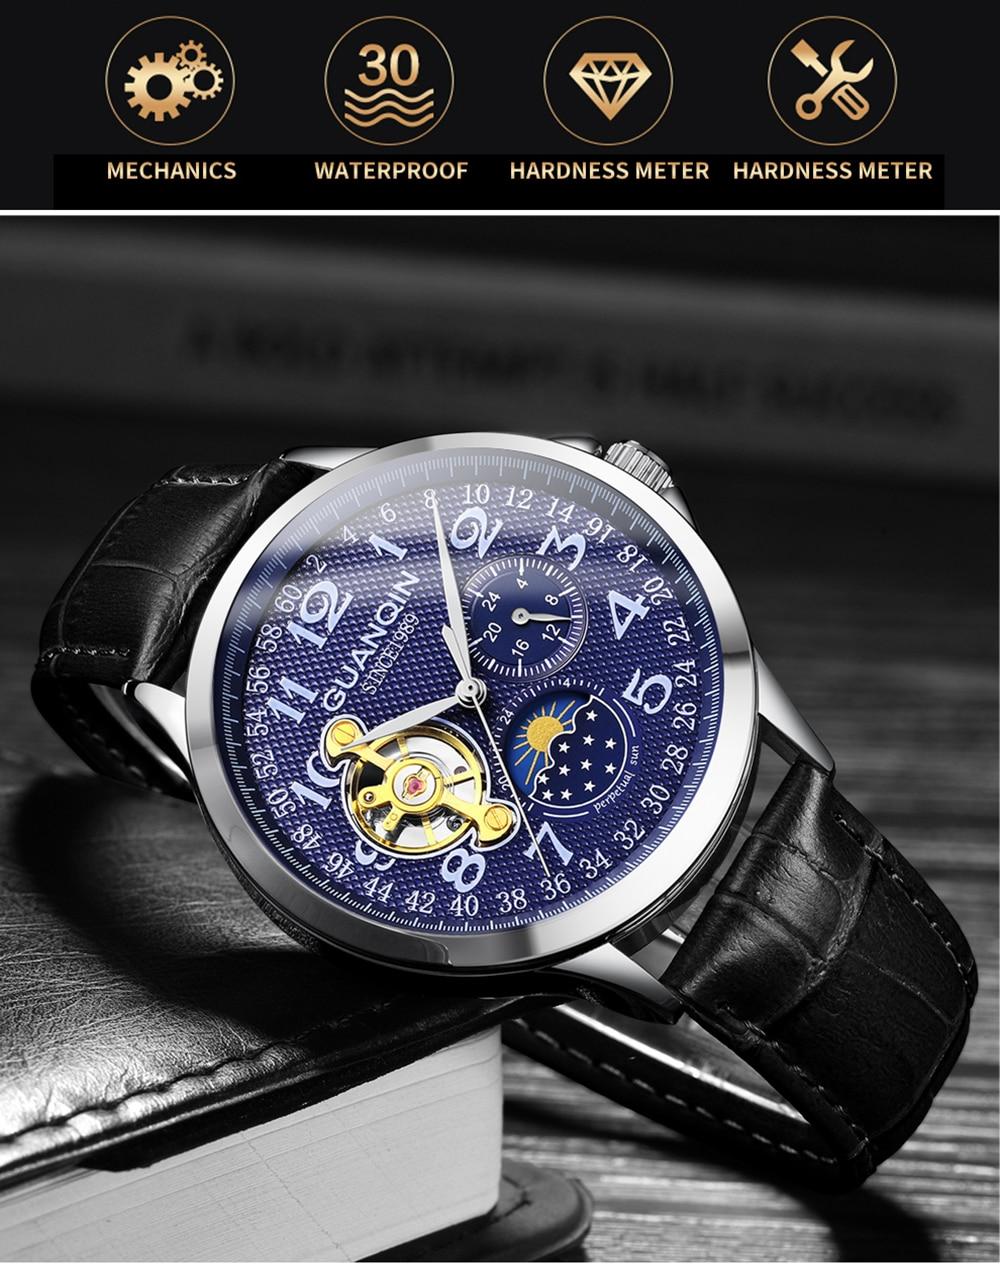 HTB1Df5ragaH3KVjSZFjq6AFWpXaw 2019 Fashion GUANQIN Mens Watches Top Brand Luxury Skeleton Watch Men Sport Leather Tourbillon Automatic Mechanical Wristwatch